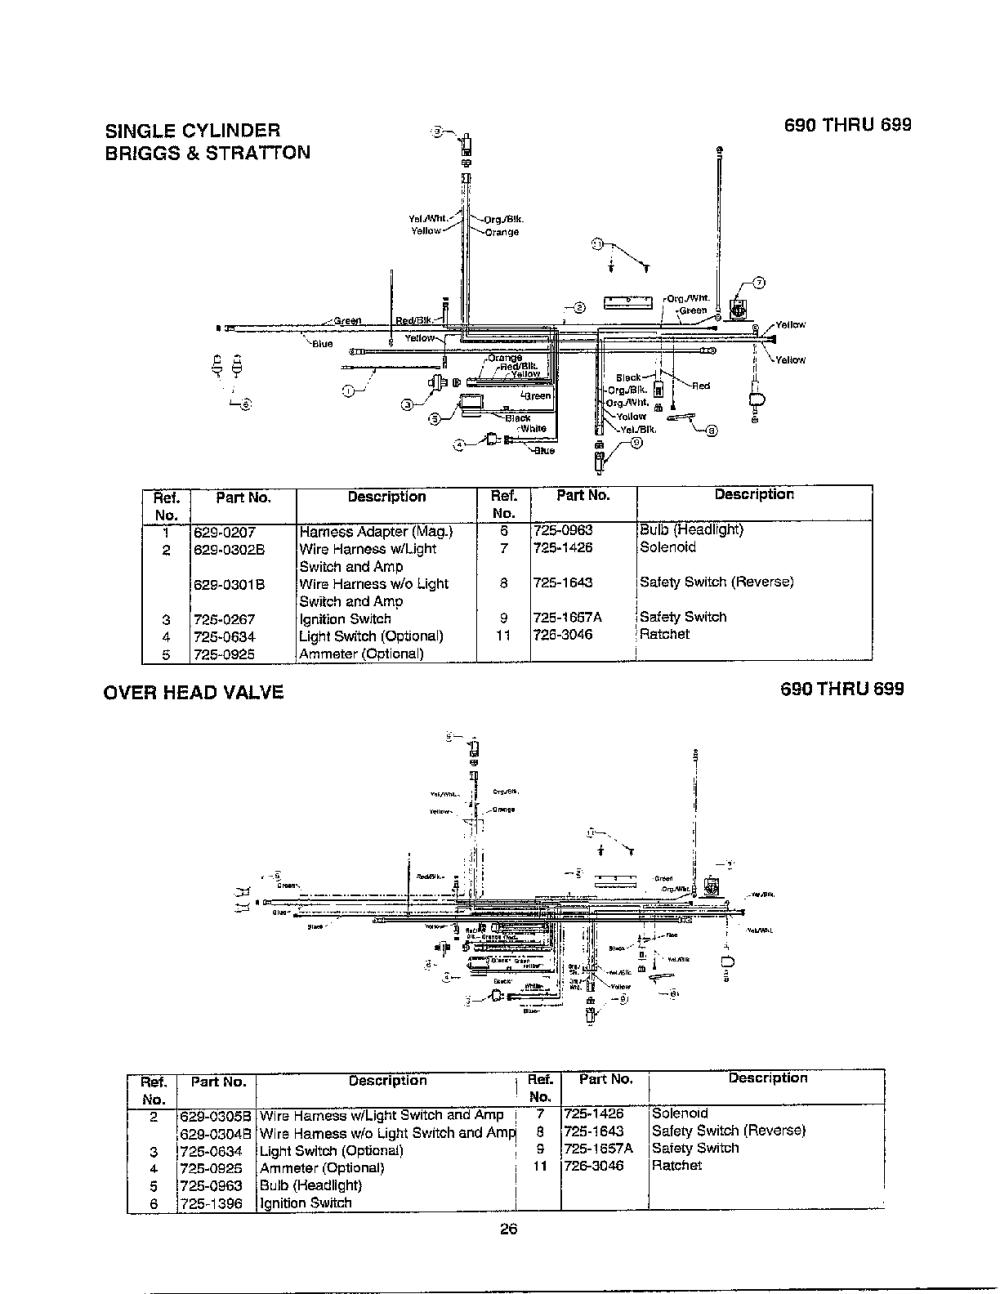 medium resolution of mtd 690 thru 699 electrical single cylinder valve diagram